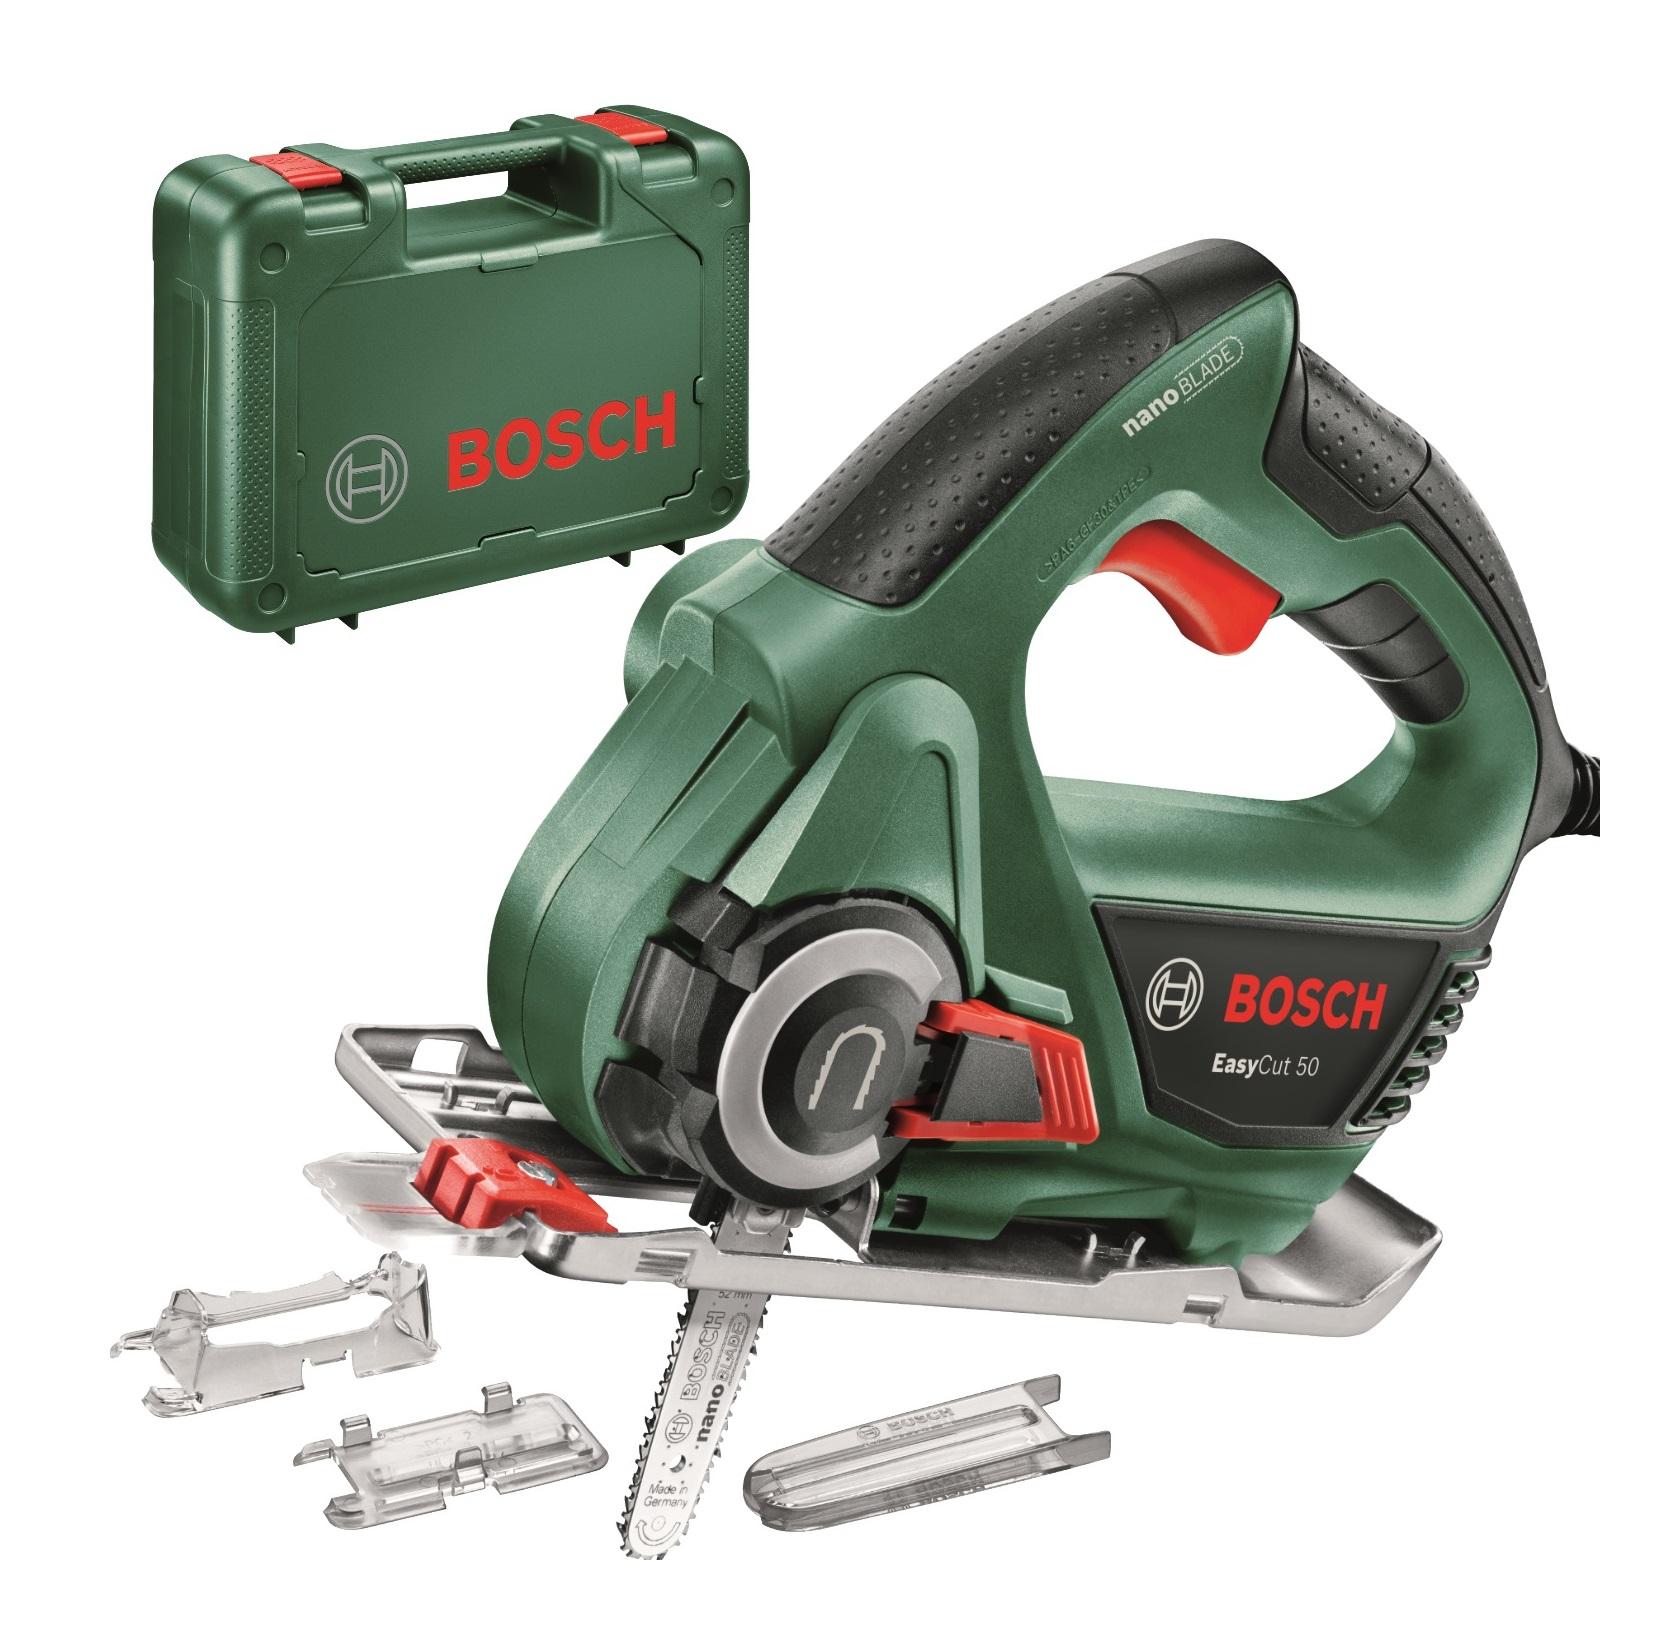 06033c8000 - bosch - easycut 50 Σέγα nanoblade 500 watt-- ΣΕΓΕΣ